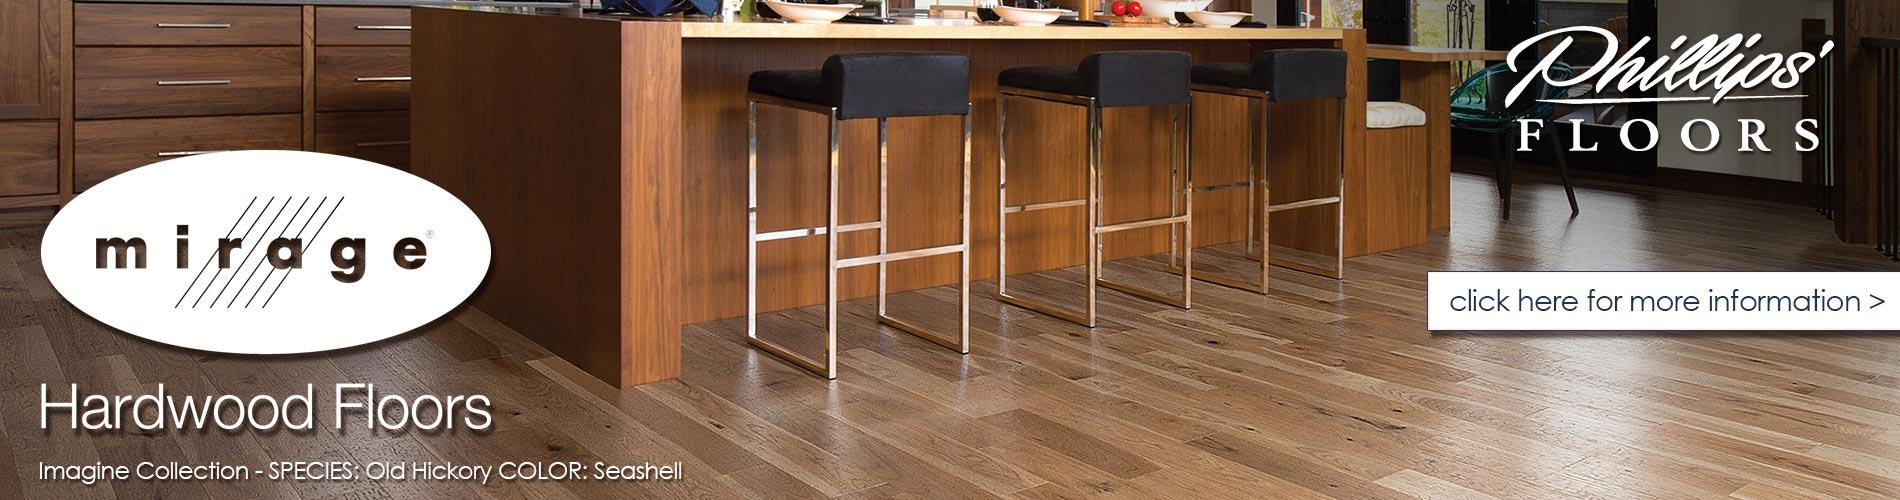 floor gallery com decor hardwood red oak floors apricot bedroom dubeau